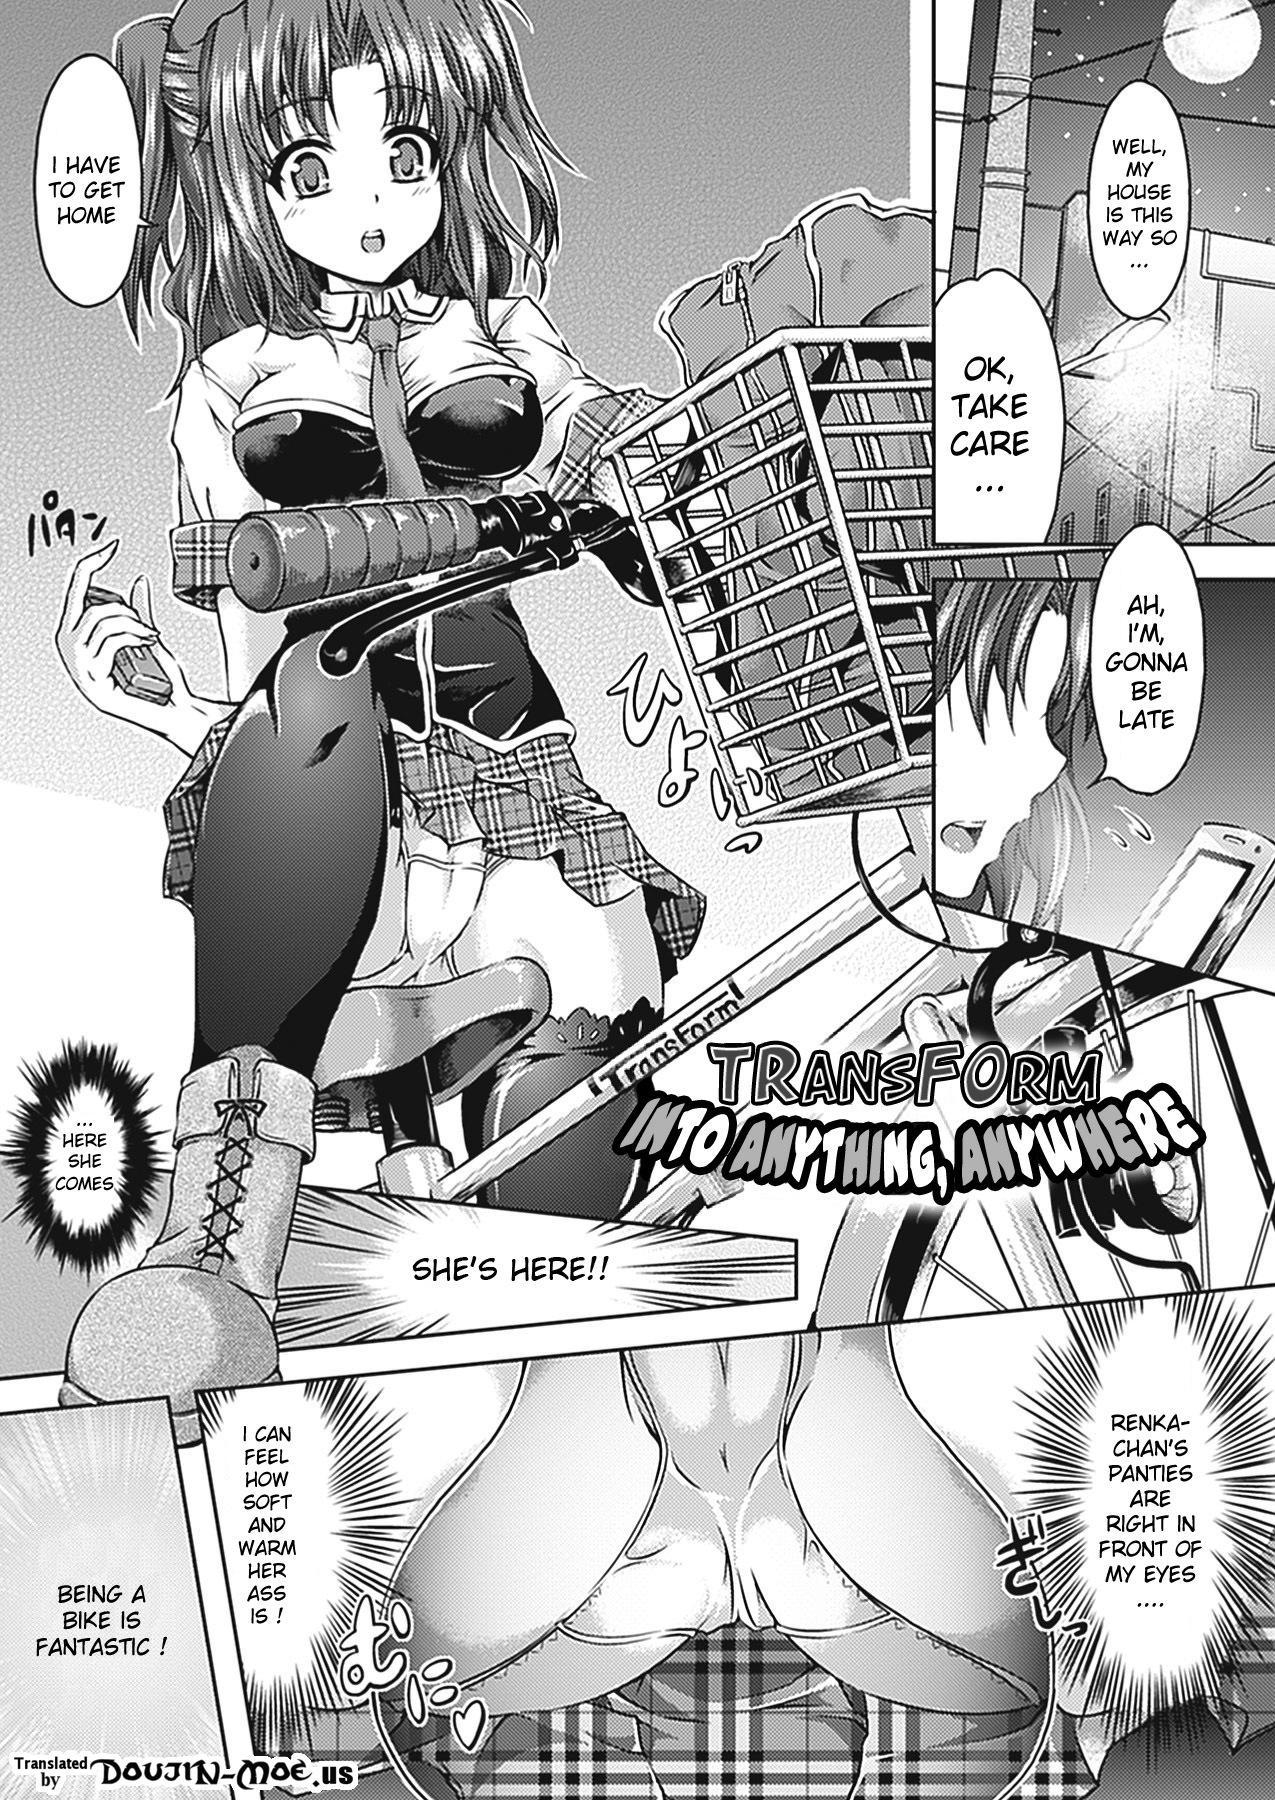 [Taniguchi-san] Girl Play - Trans-Sexual Fiction the Girls Play - ⚤TSF Catalog (English) {doujin-moe.us} 43